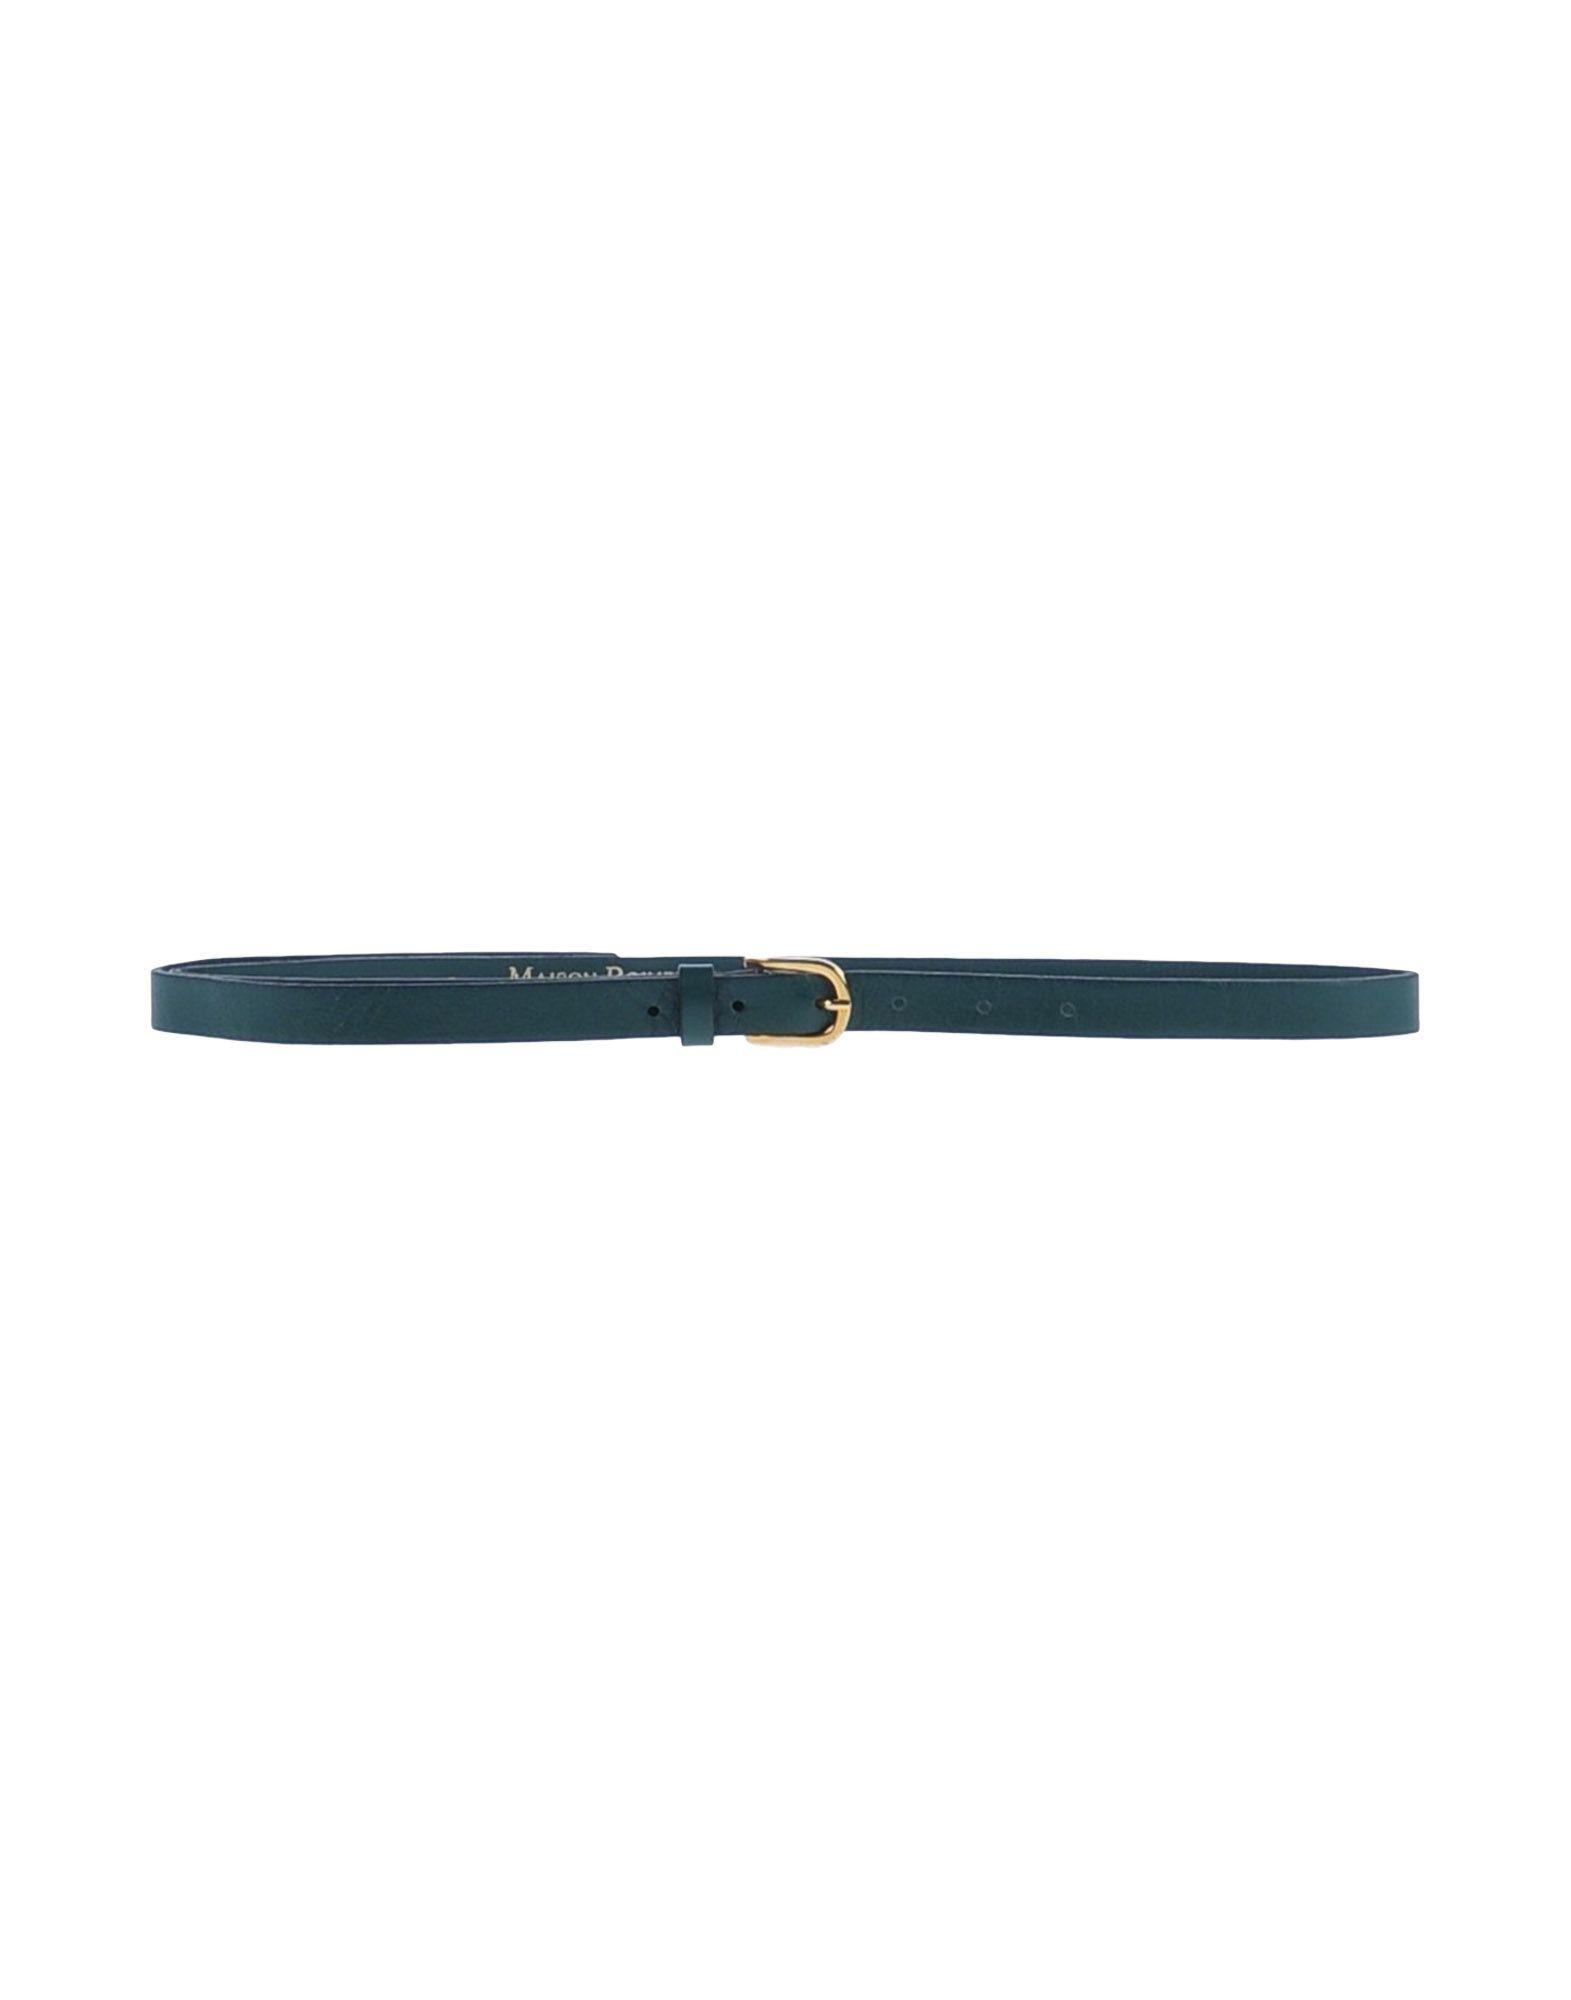 MAISON BOINET Belts